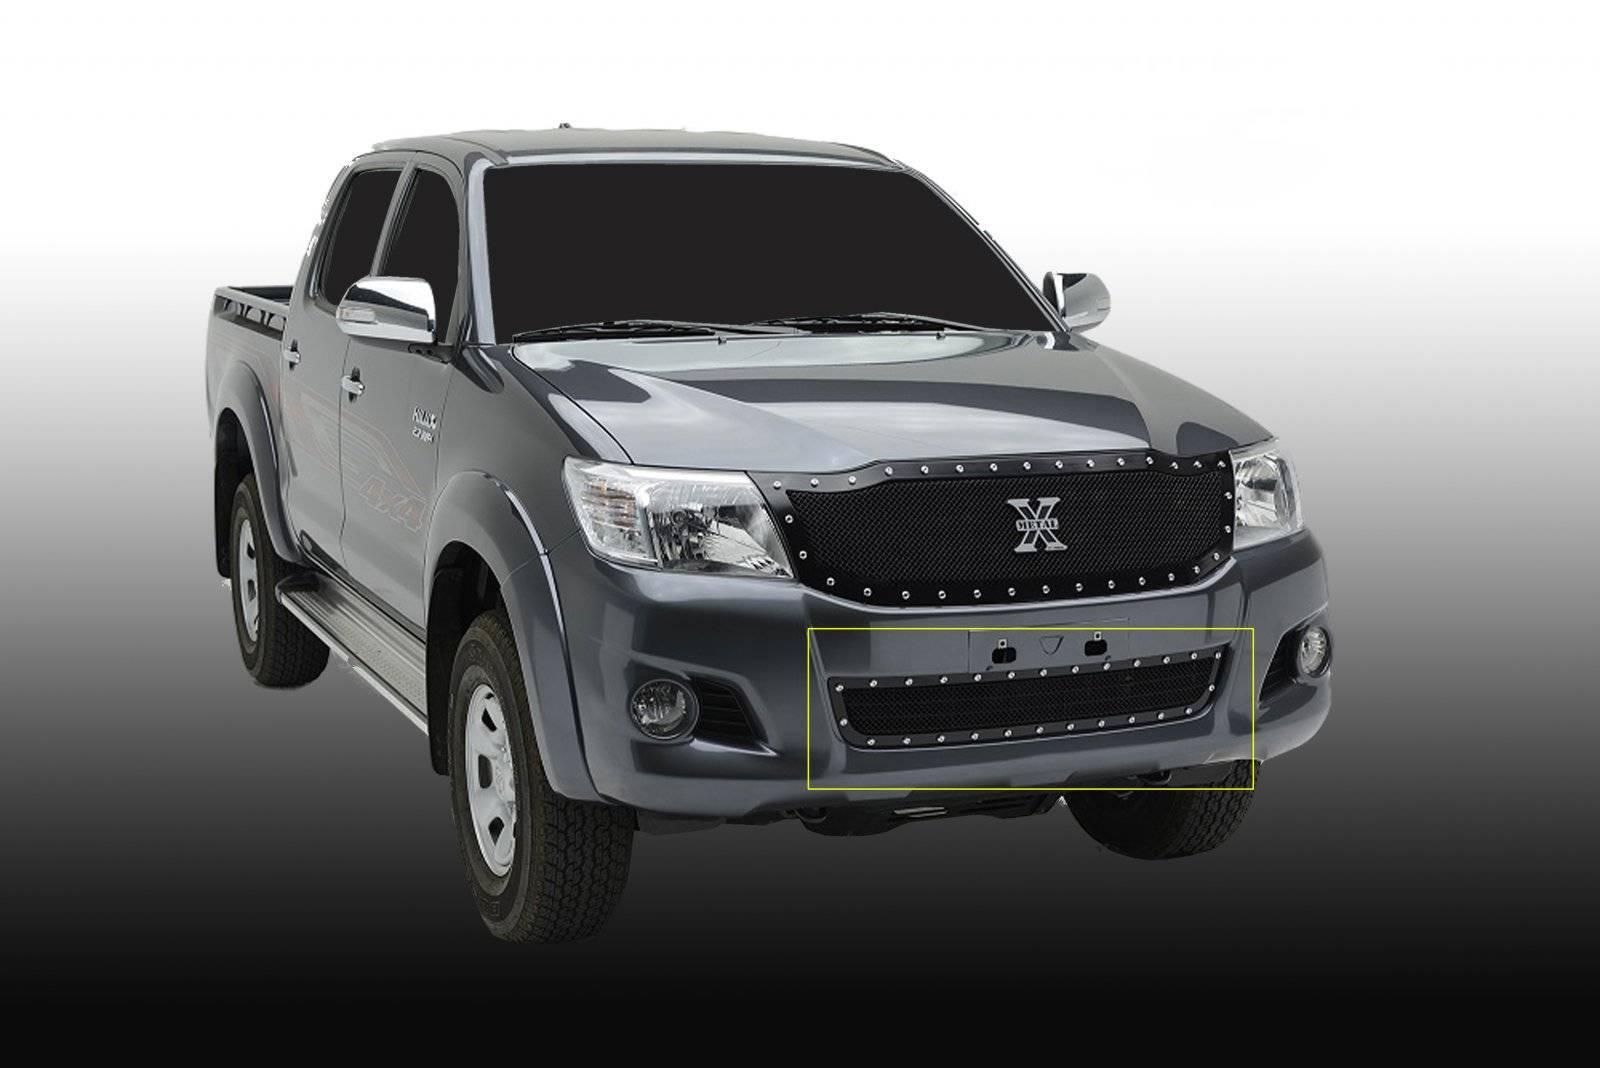 T-REX Grilles - 2012-2015 Toyota Hilux X-Metal Bumper Grille, Black, 1 Pc, Overlay, Chrome Studs - PN #6729091